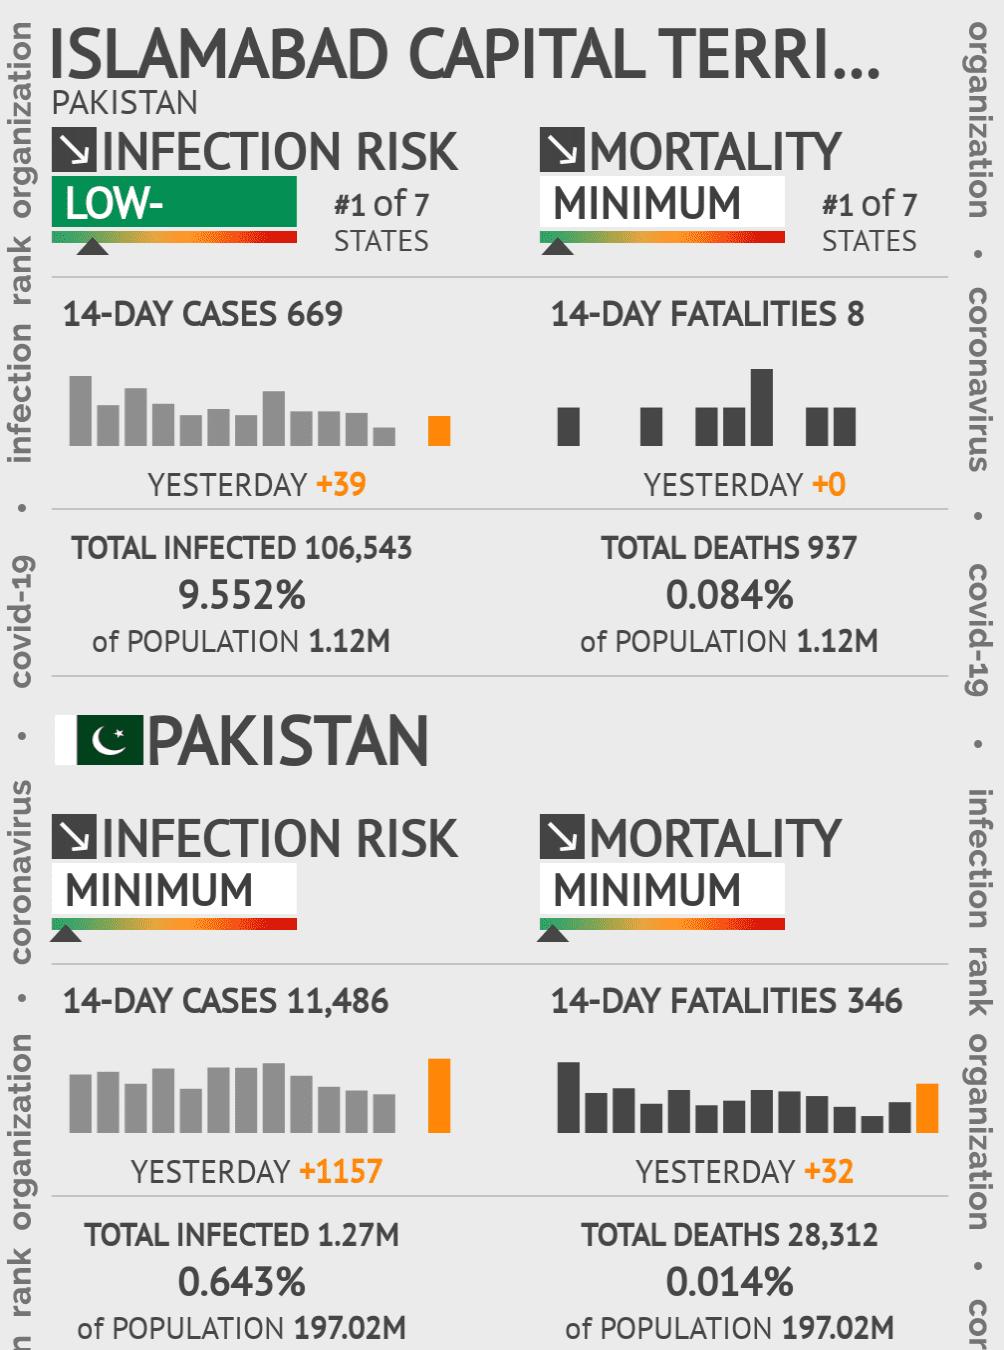 Islamabad Coronavirus Covid-19 Risk of Infection on February 22, 2021